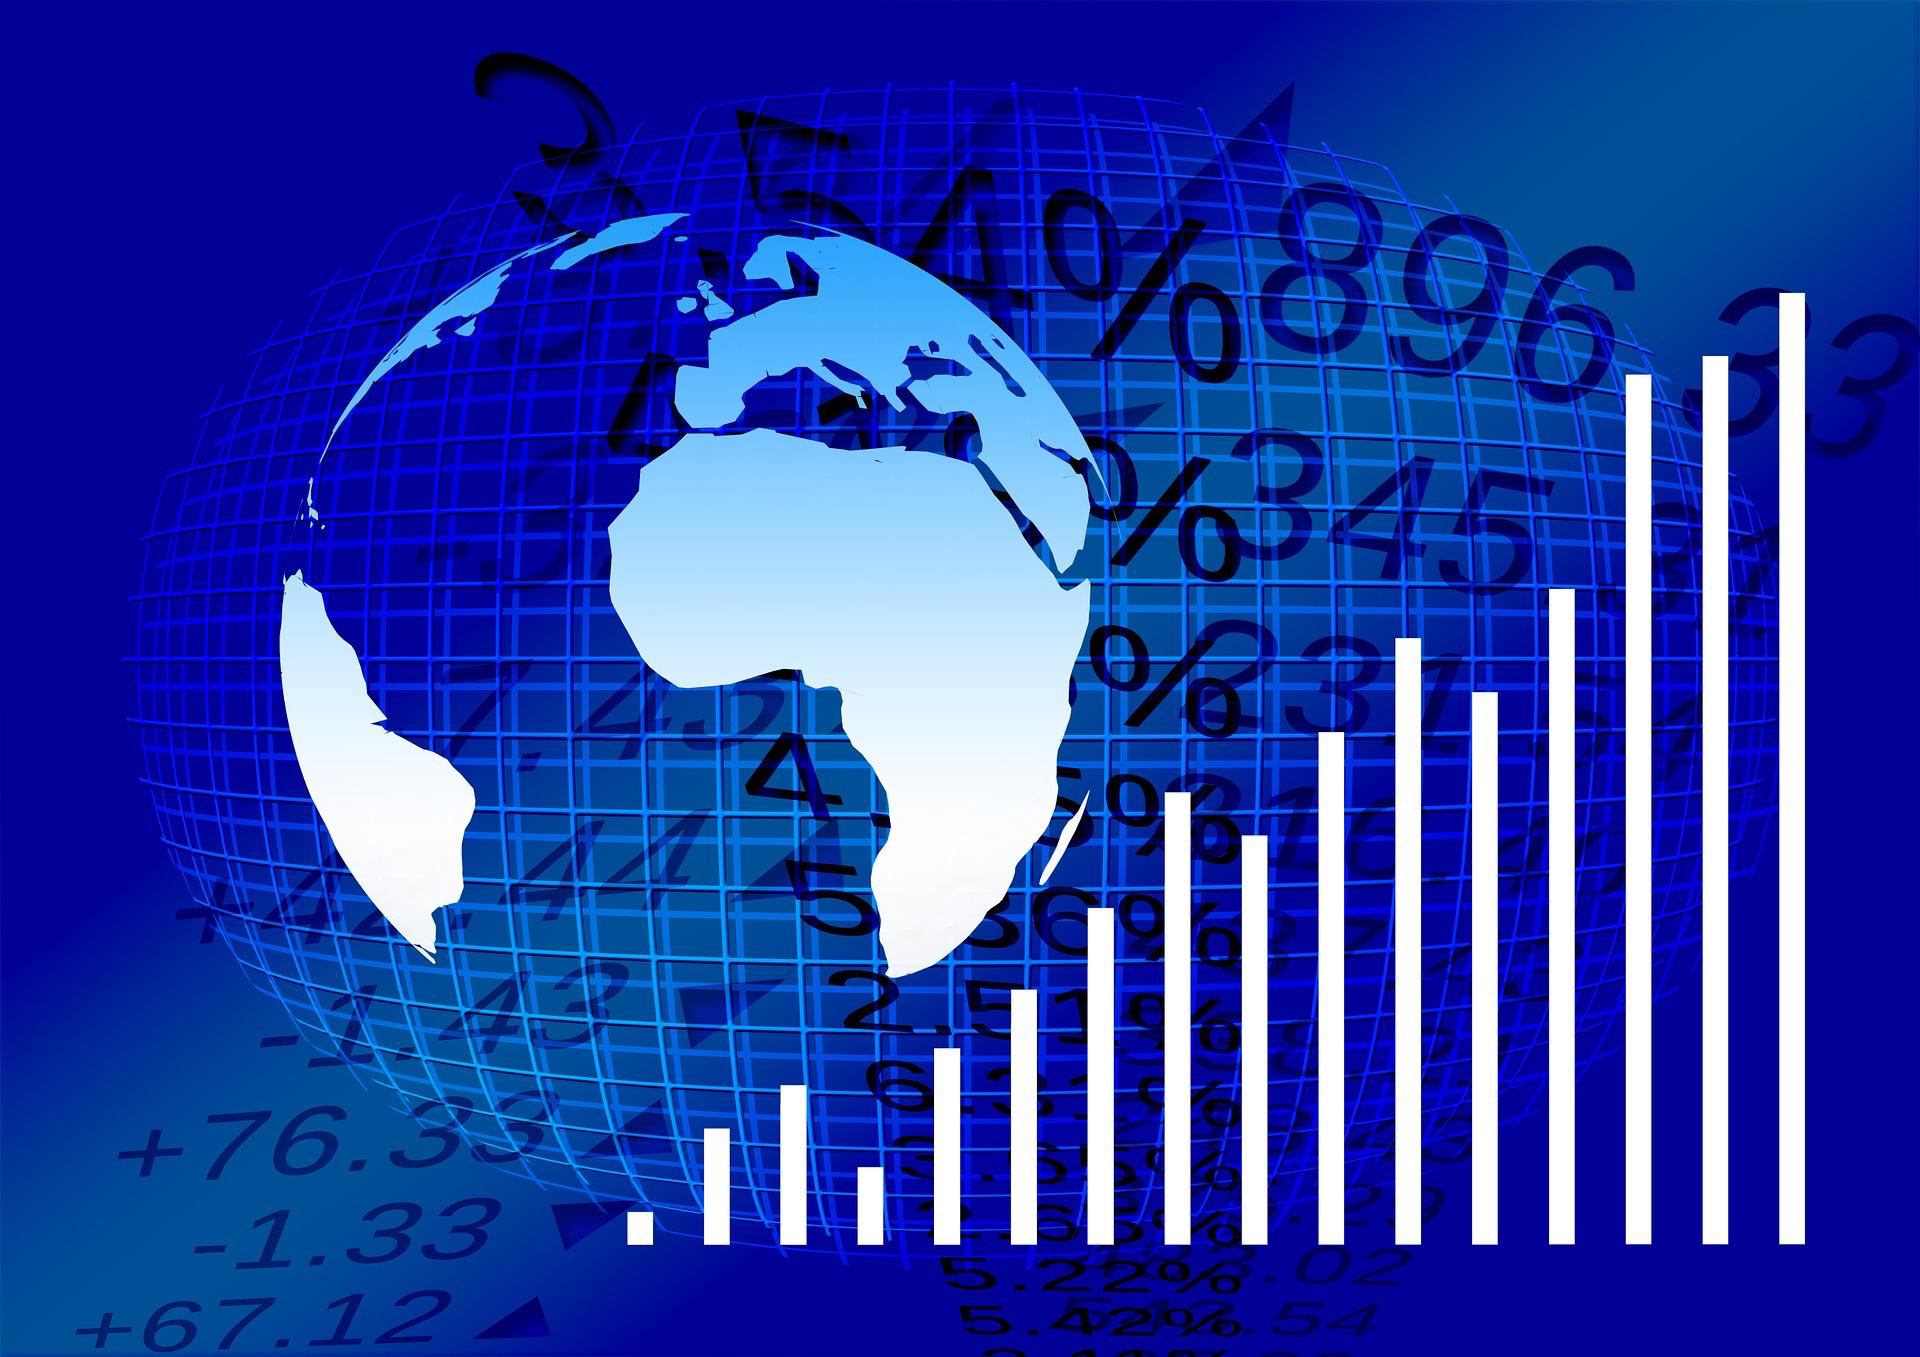 stock-exchange-1426335_1920.jpg